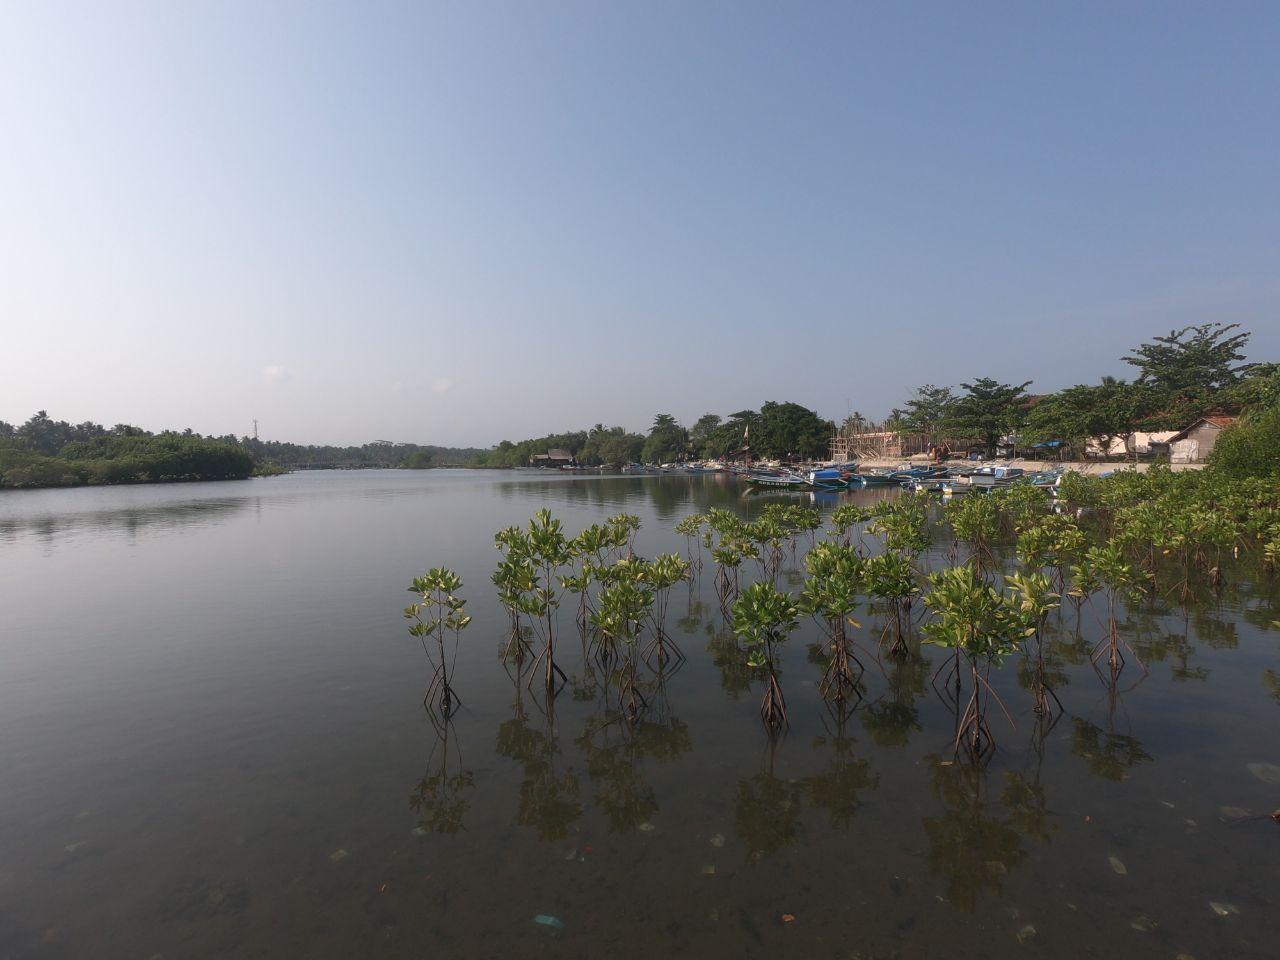 Penanaman Tumbuhan Mangrove di Pesisir